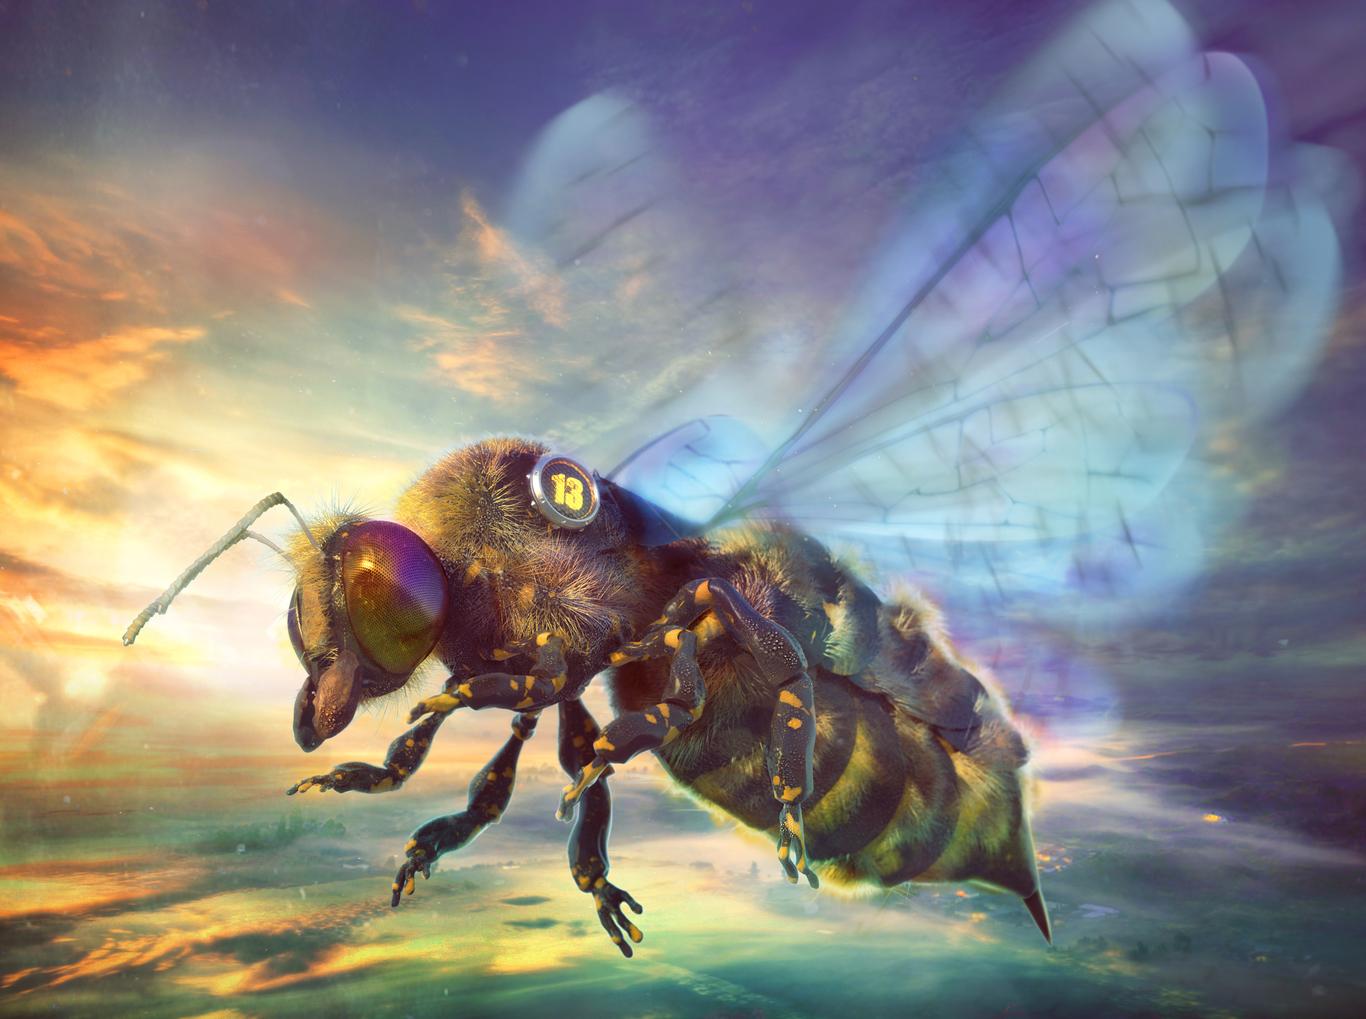 Fatcom bee13 1 a389a087 v7rc